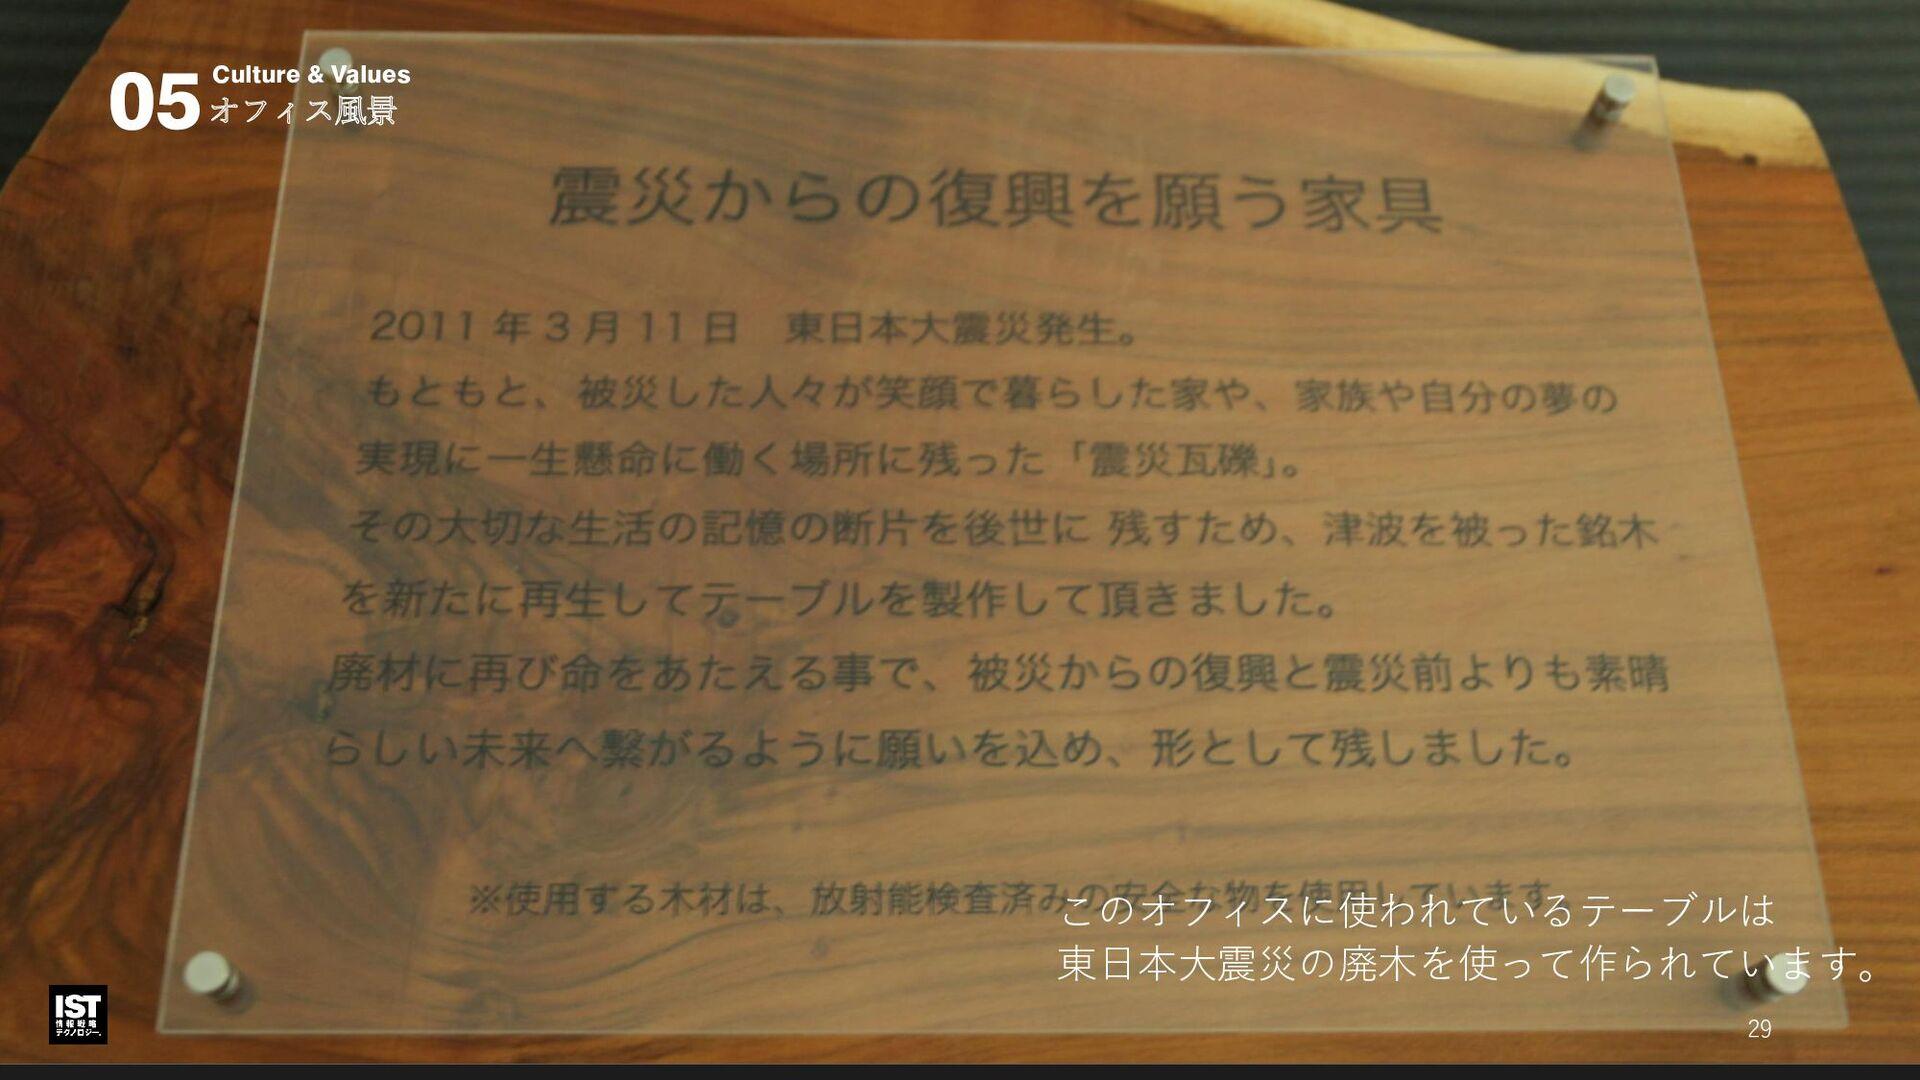 PM部 プロジェクトリーダー / 佐藤 亘 コンサルは業務課題分析のプロですが、現場から見ると...